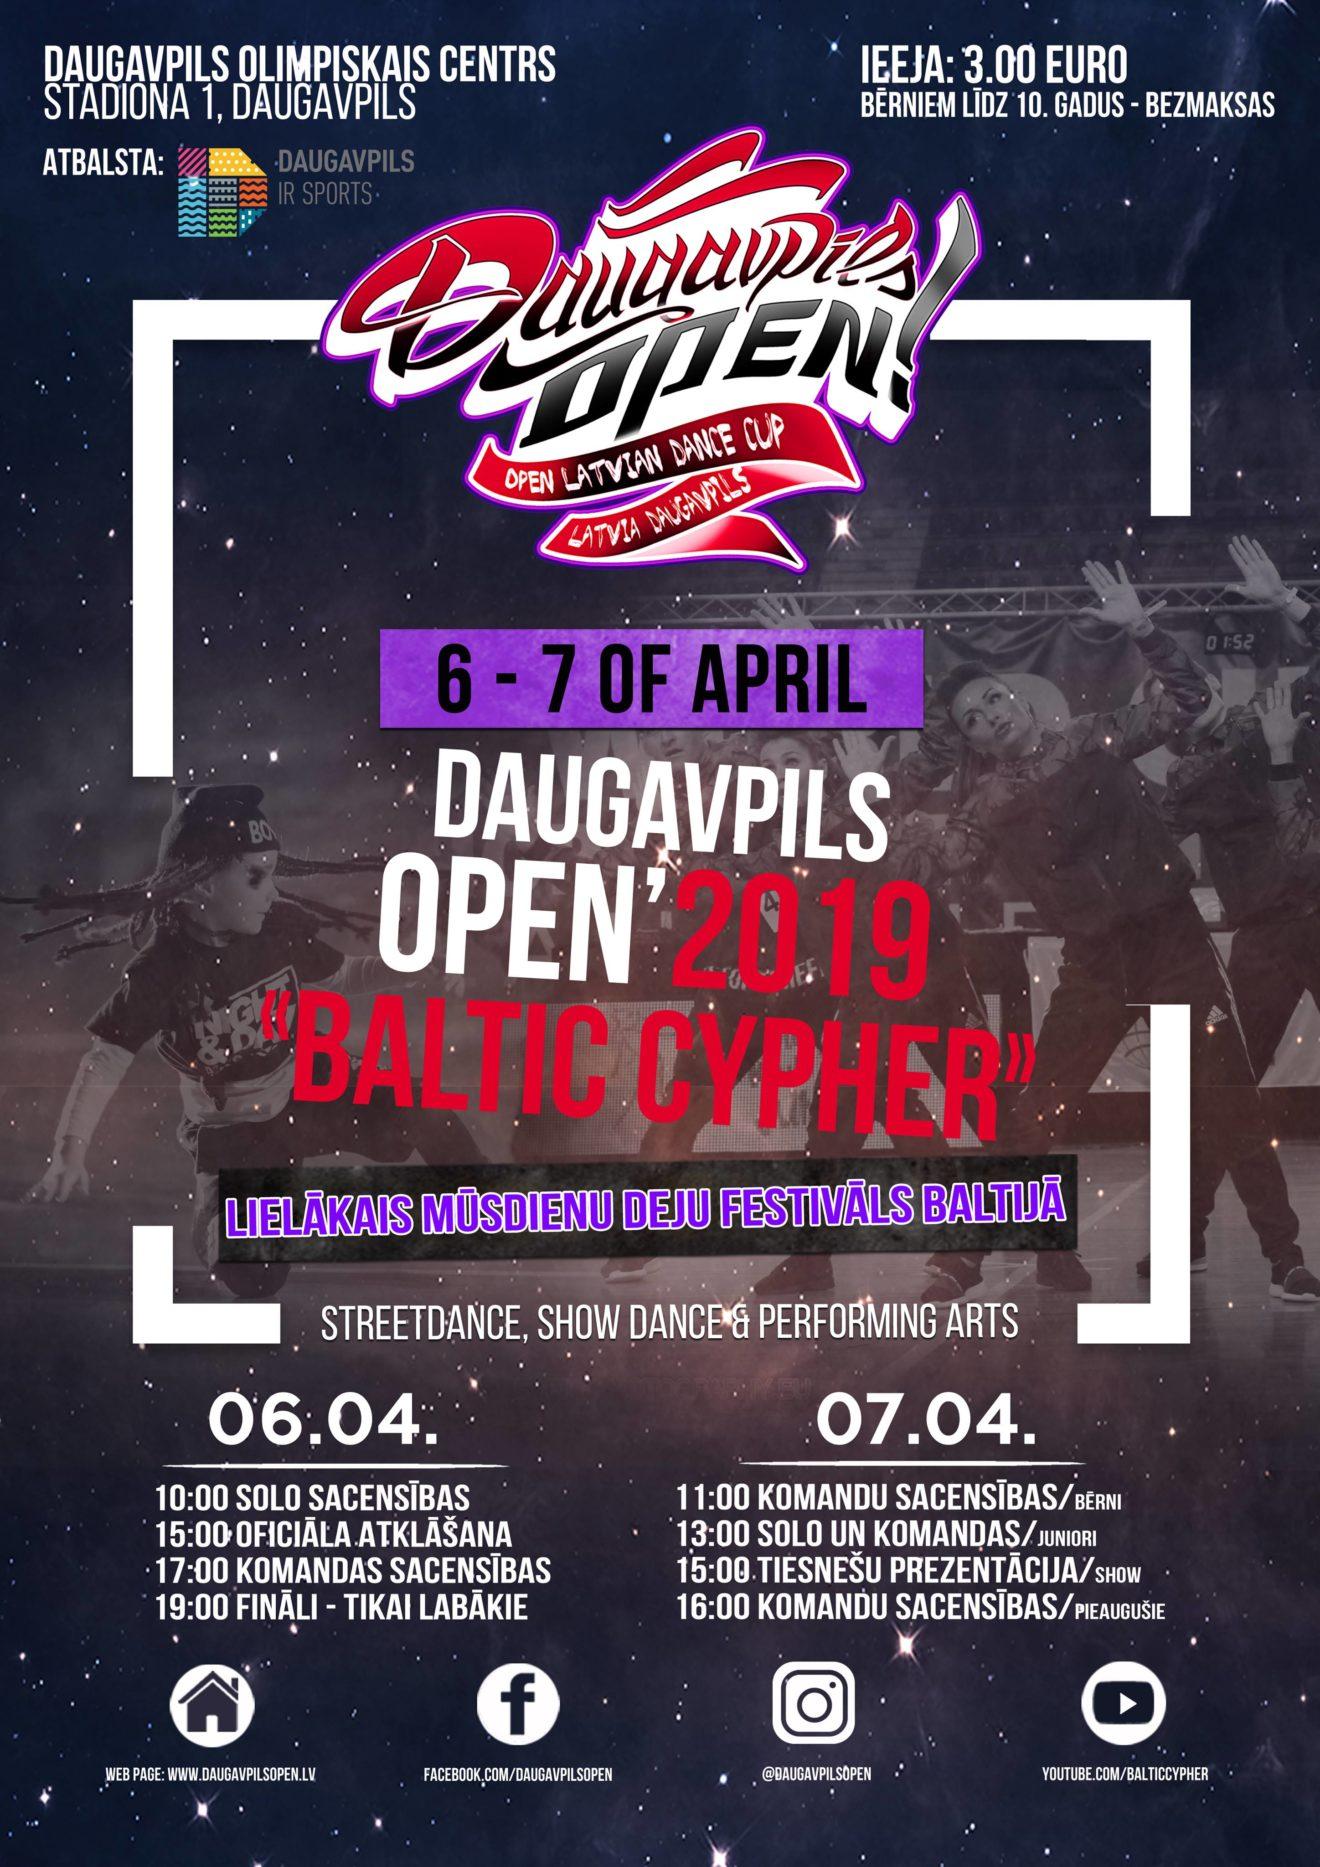 Daugavpils Open